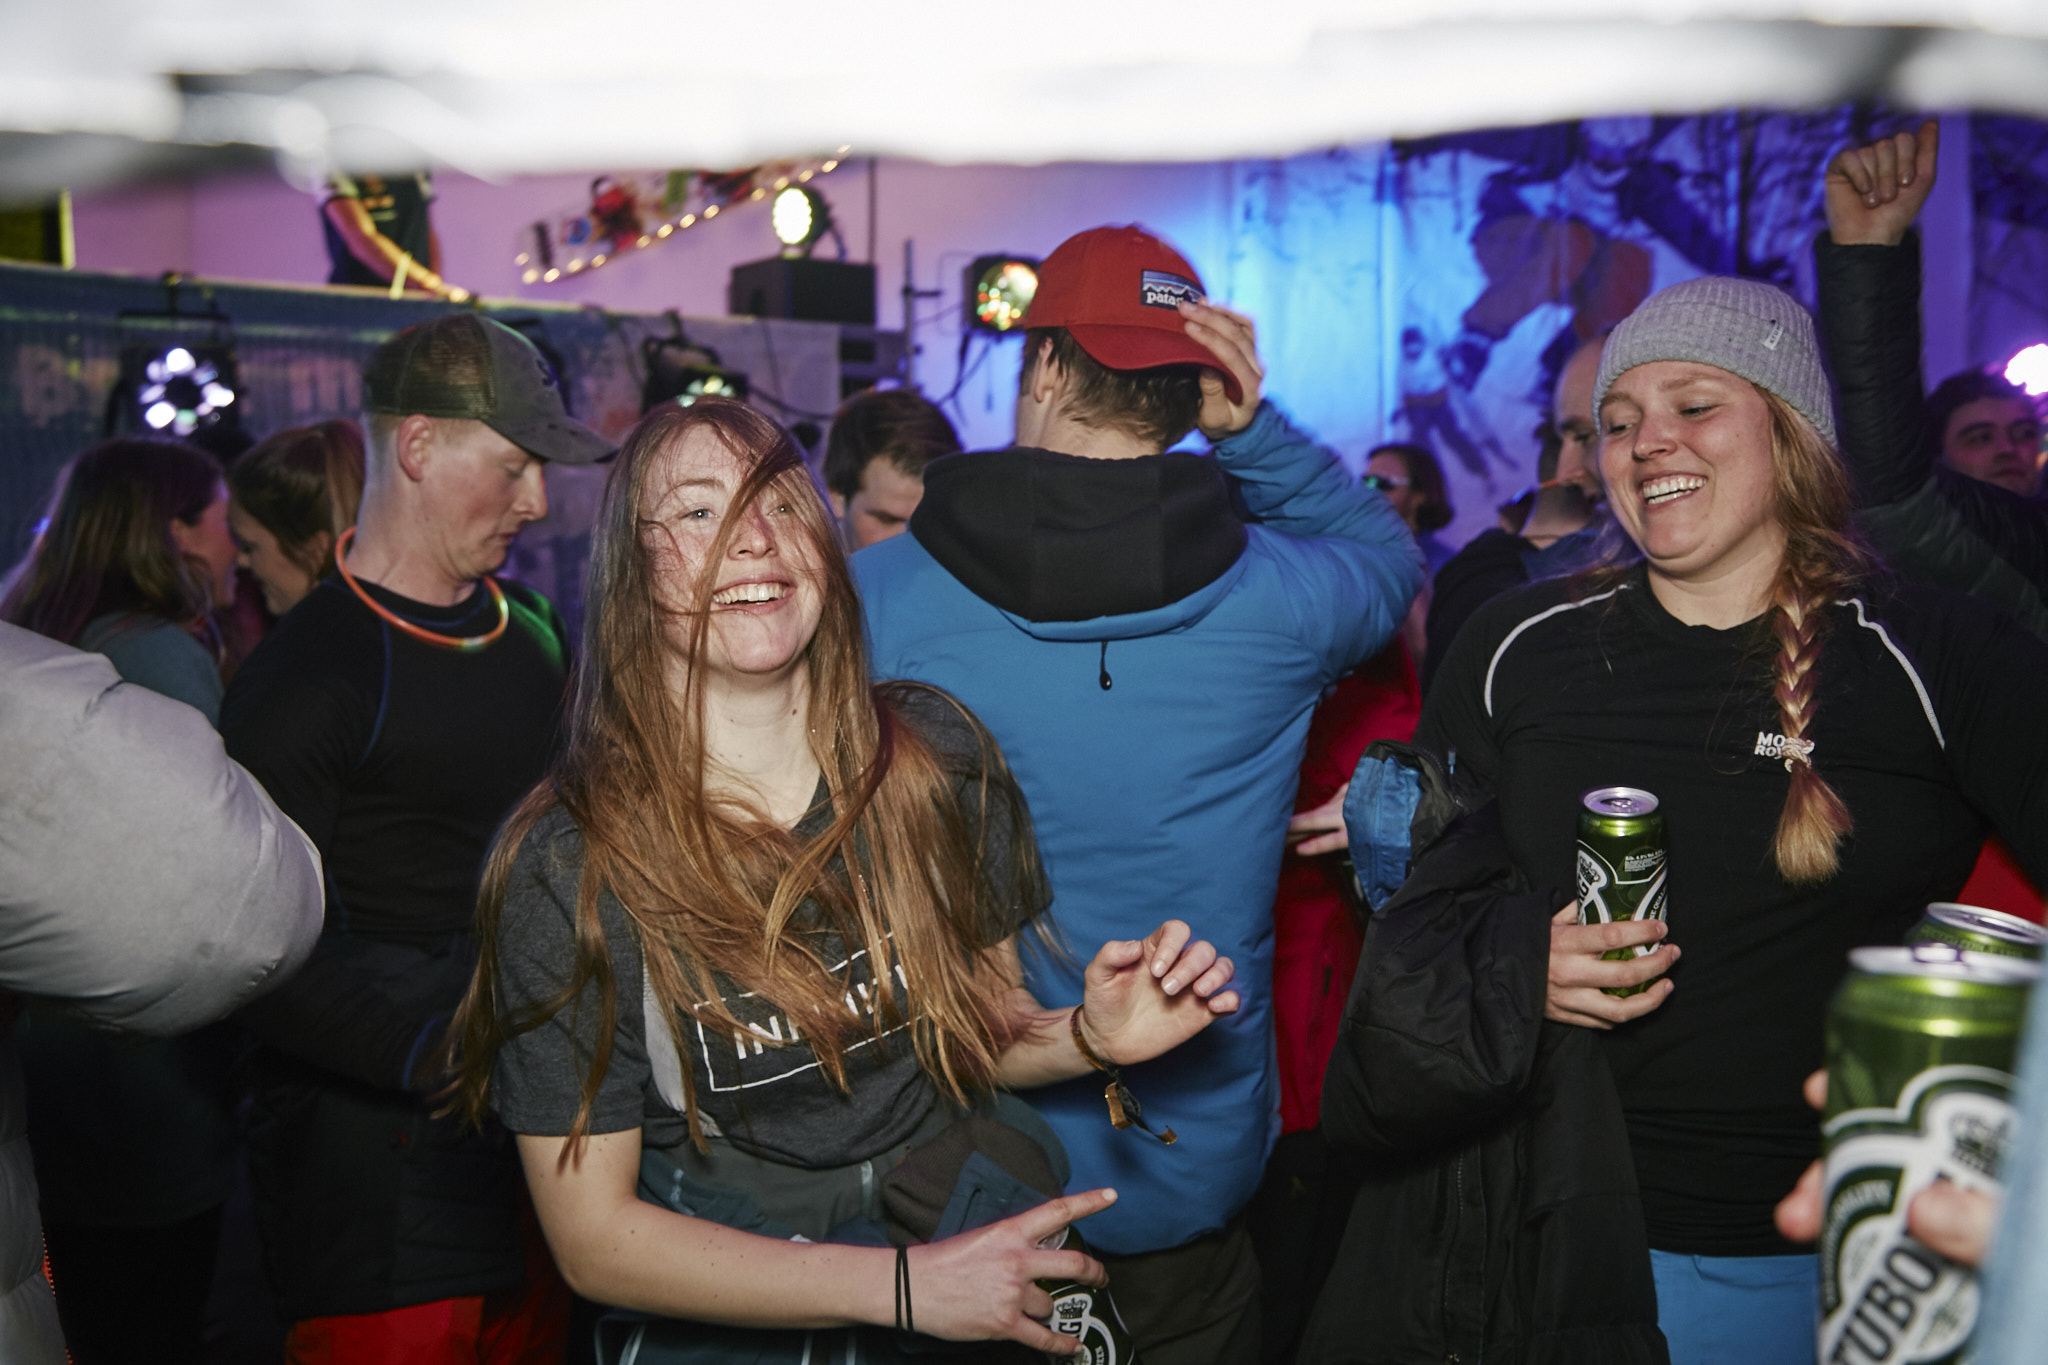 2018.02.22-Fjellsportfestival-Afterski-077.jpg